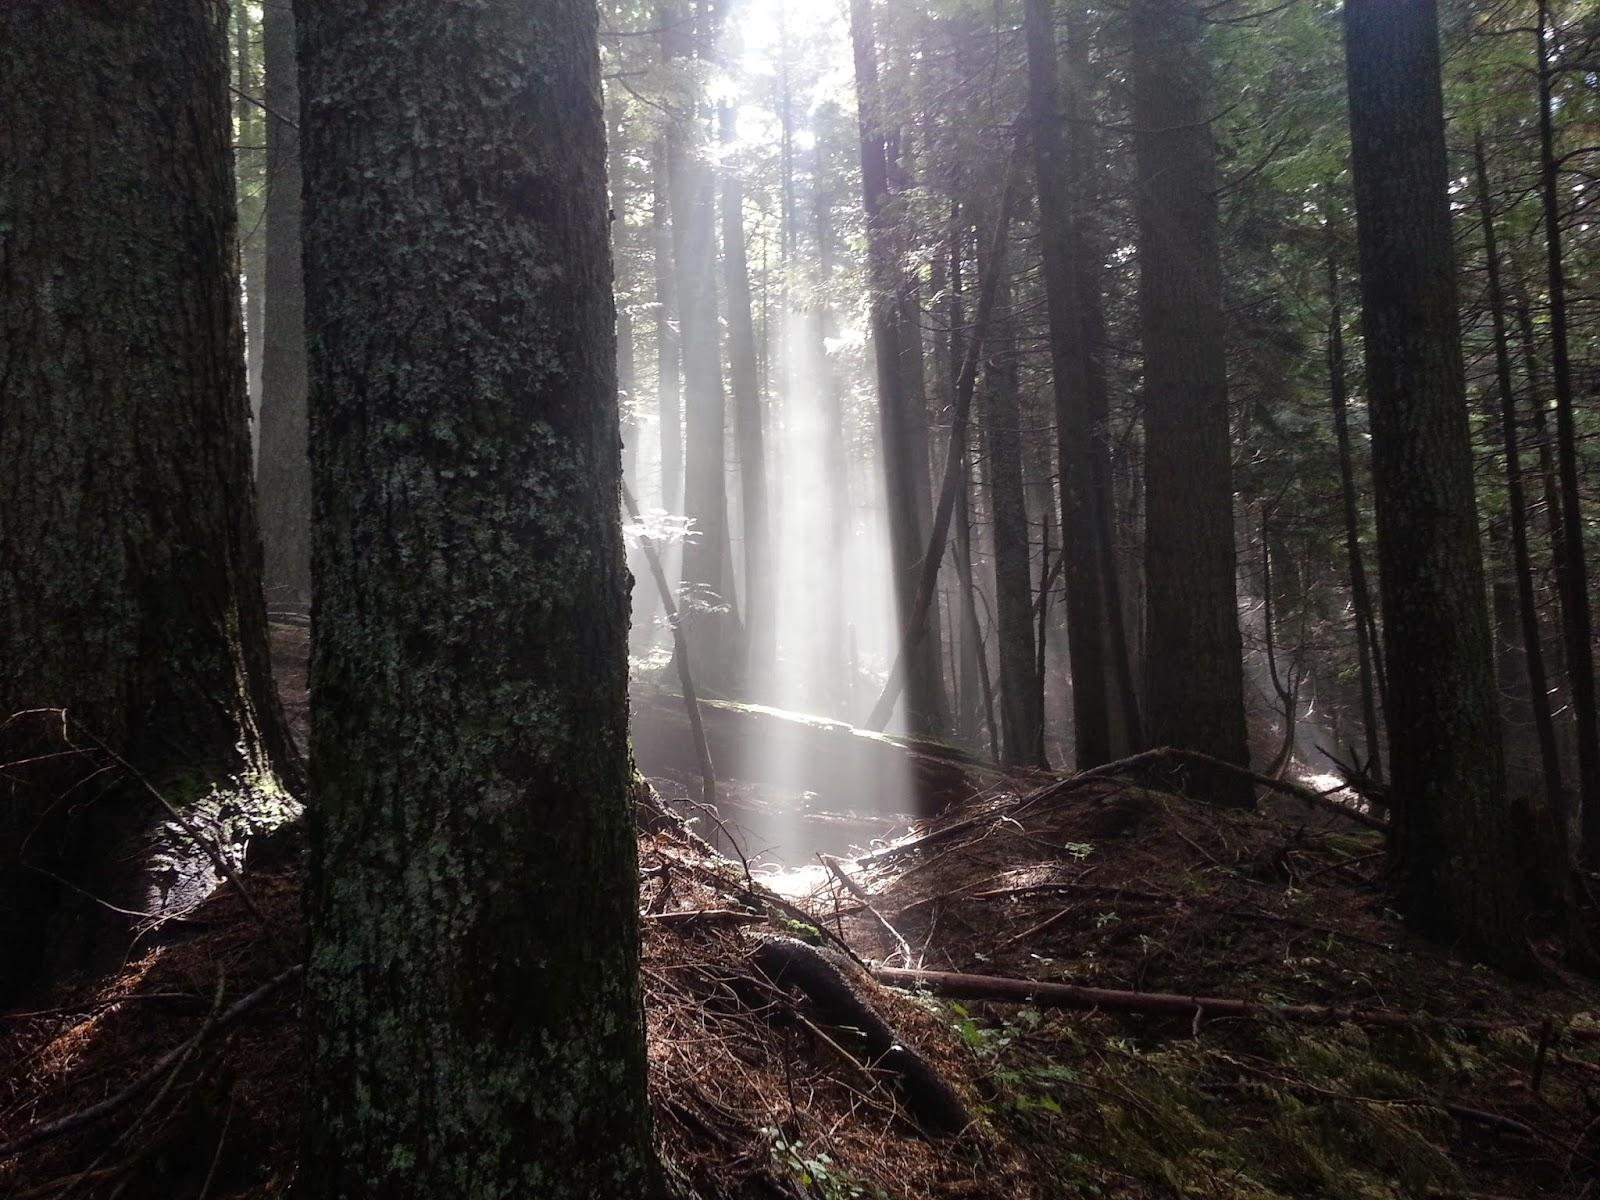 Rattlesnake Ridge trees cr Jill Yotz, 2014